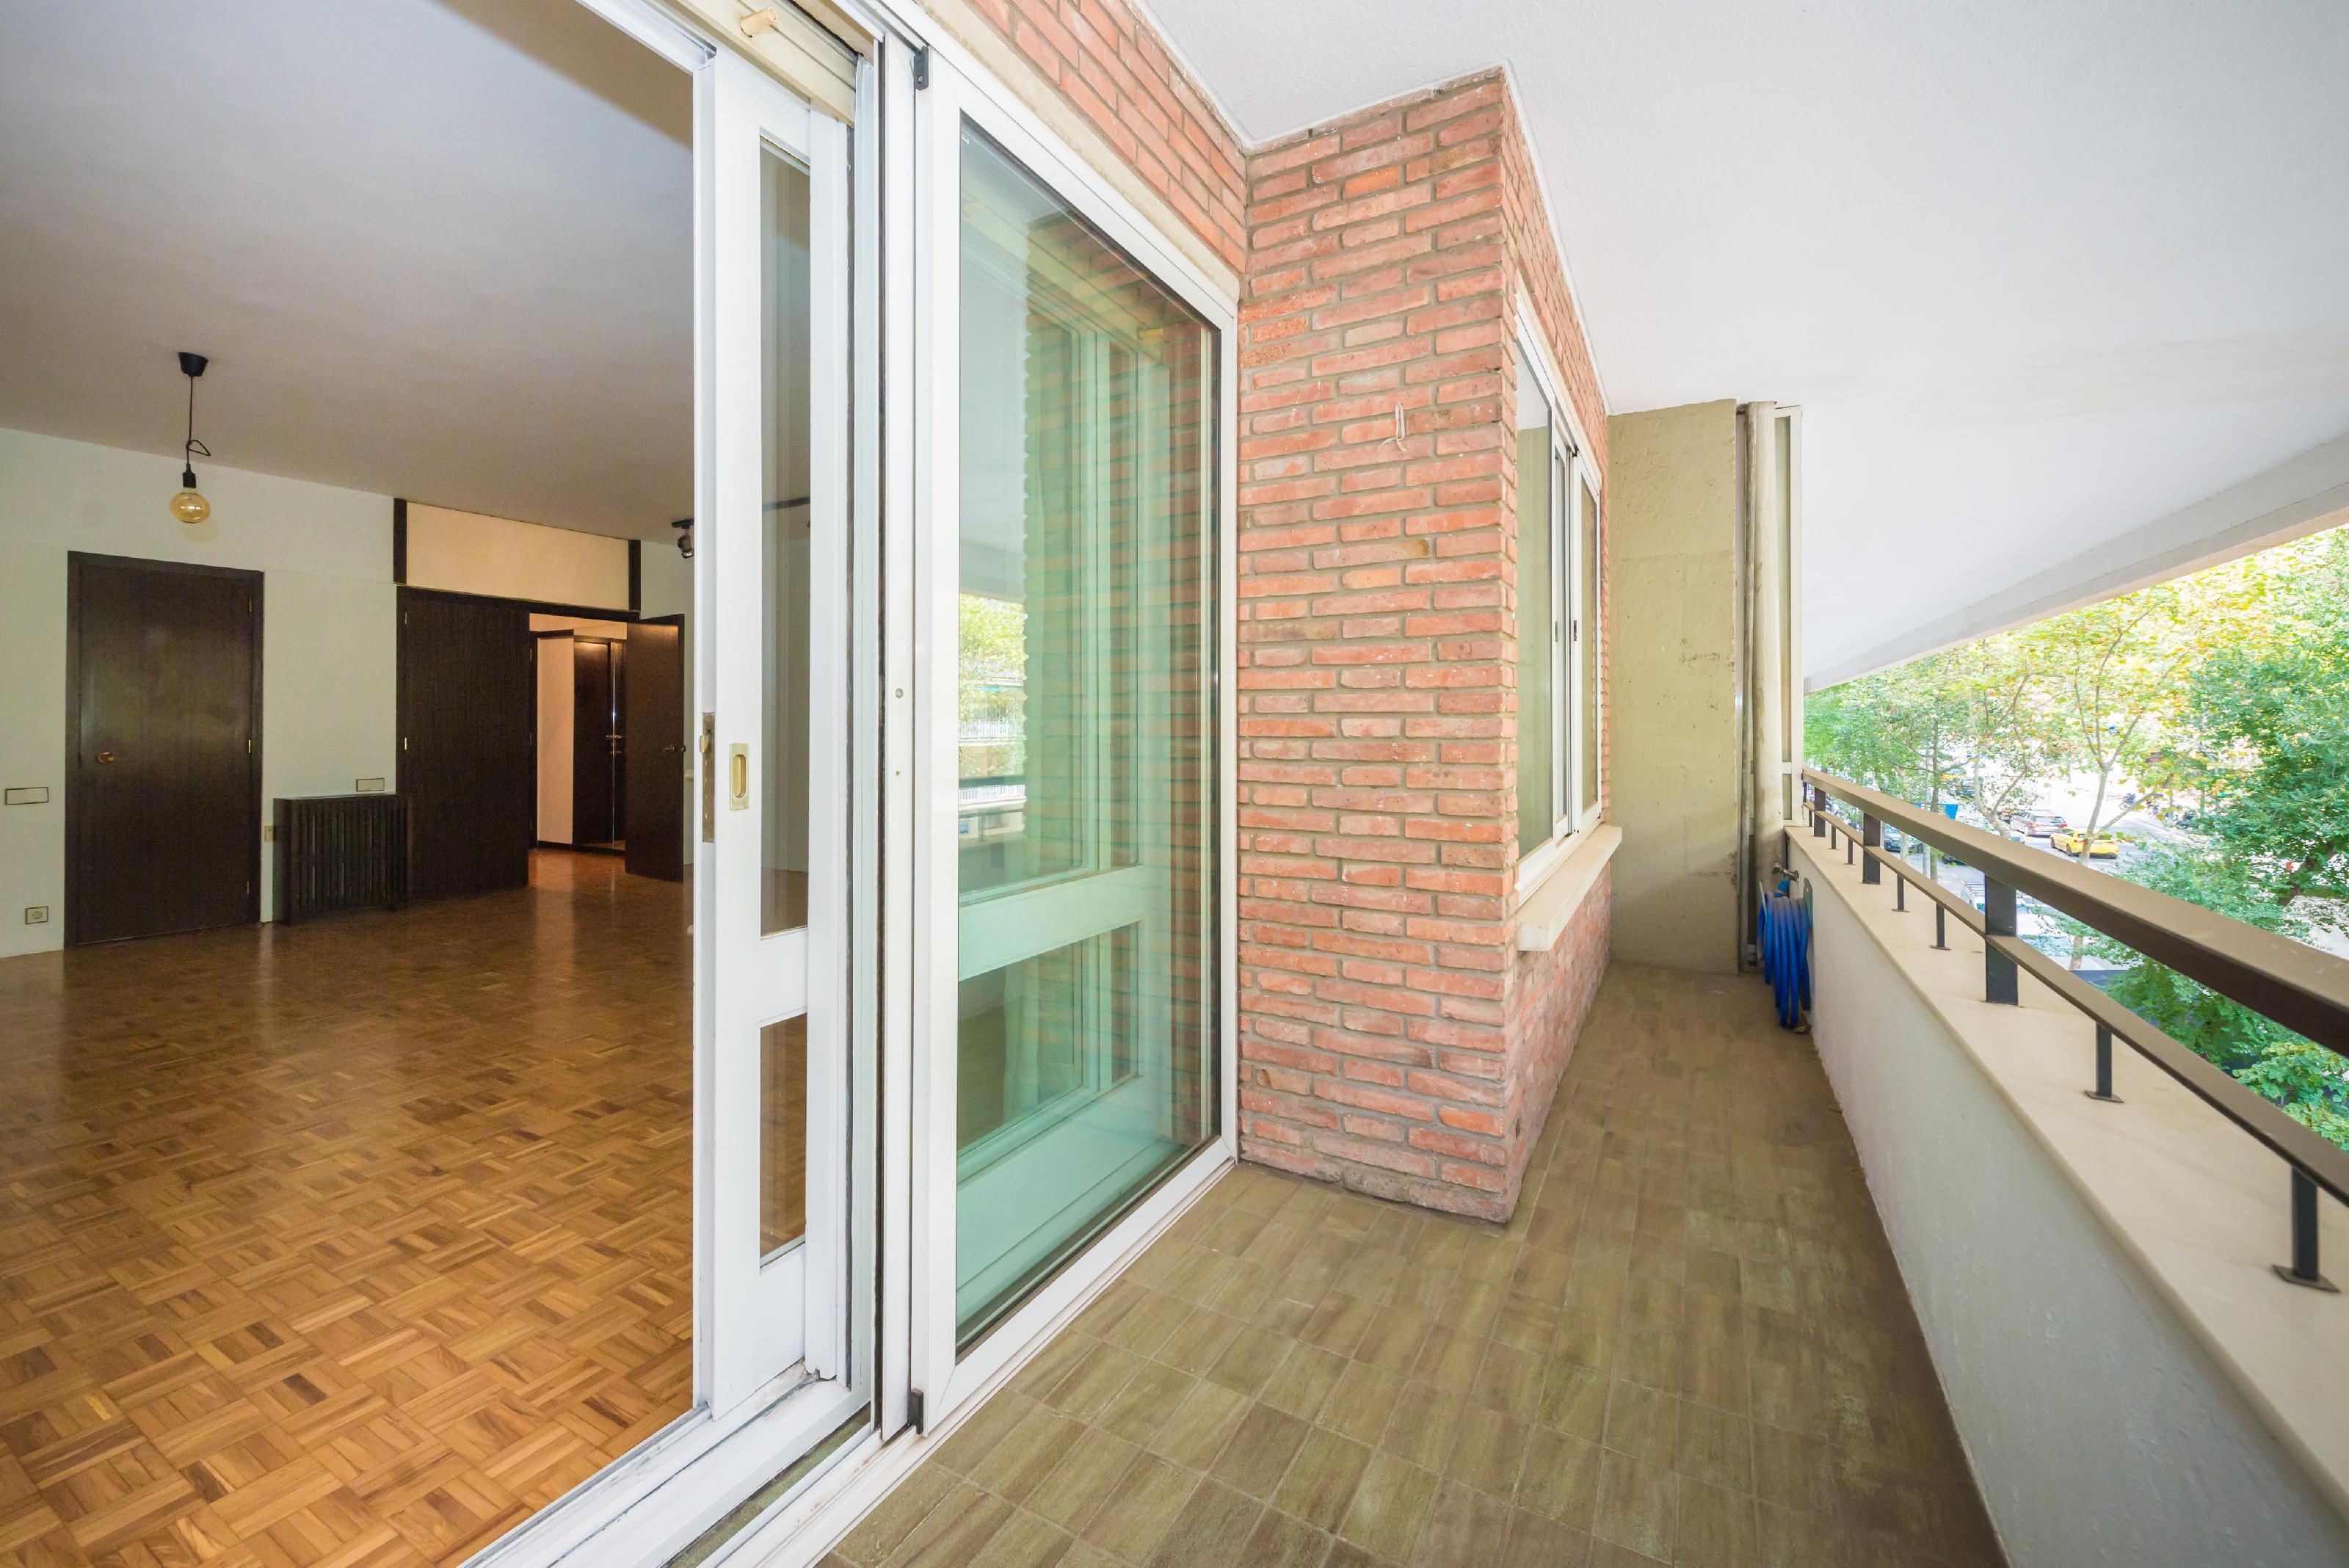 253470 Flat for sale in Sarrià-Sant Gervasi, El Putxet and Farró 1